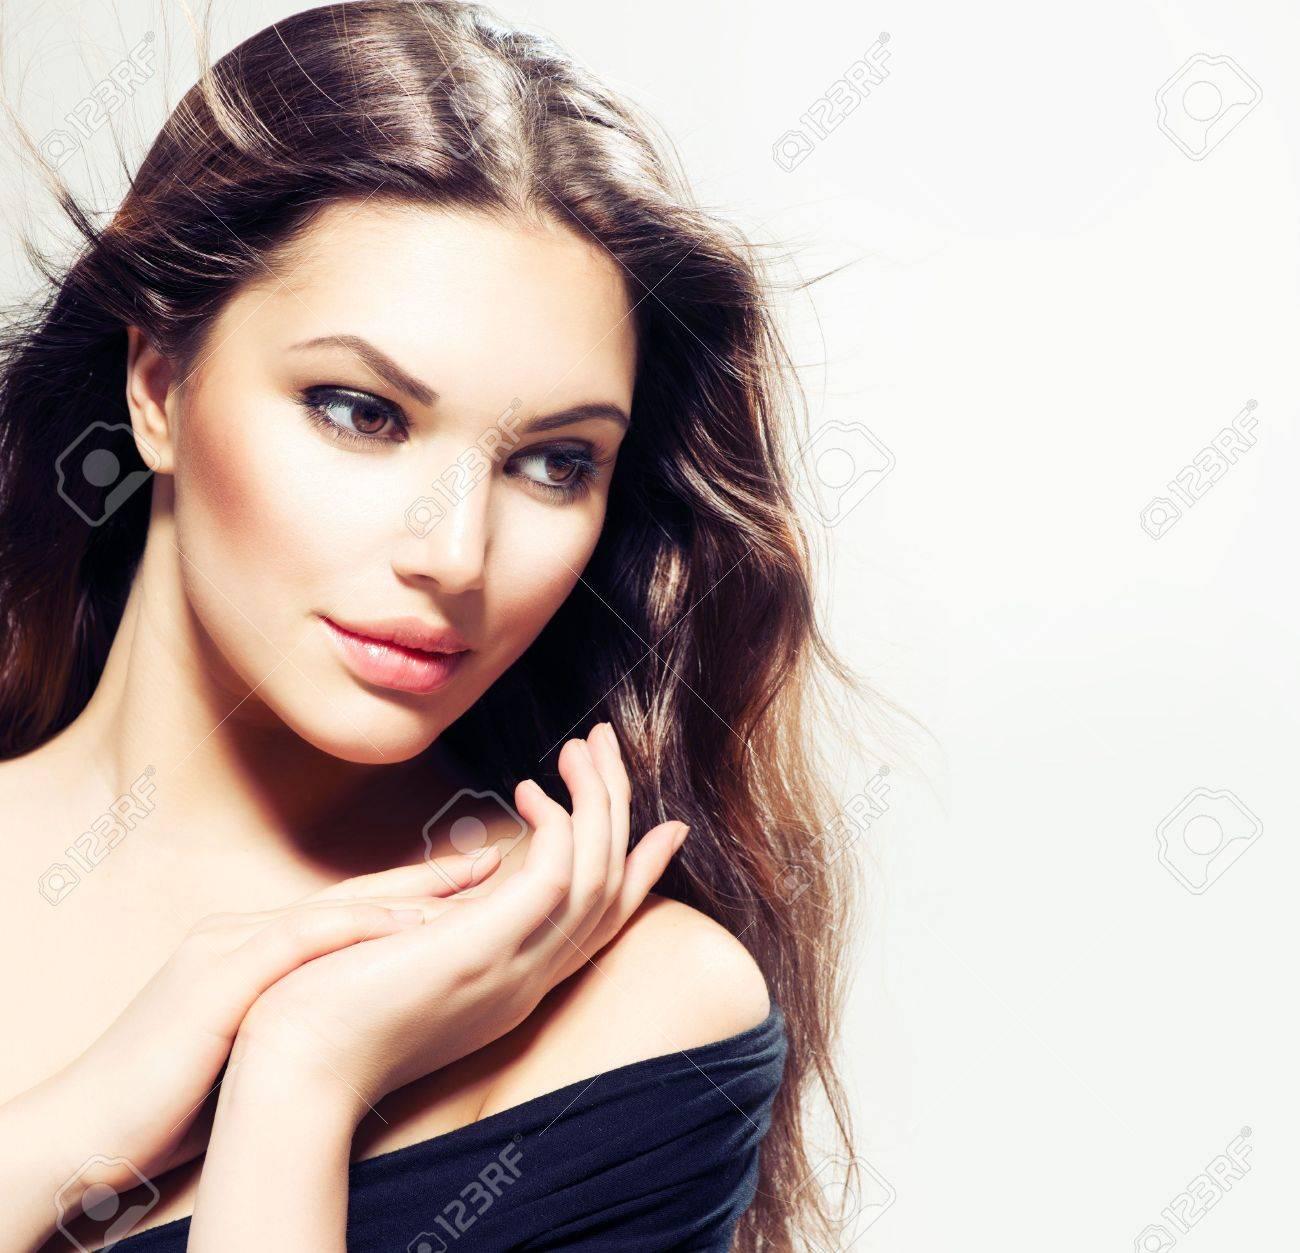 Beauty Woman portrait with long hair  Beautiful Brunette Girl Stock Photo - 18388756